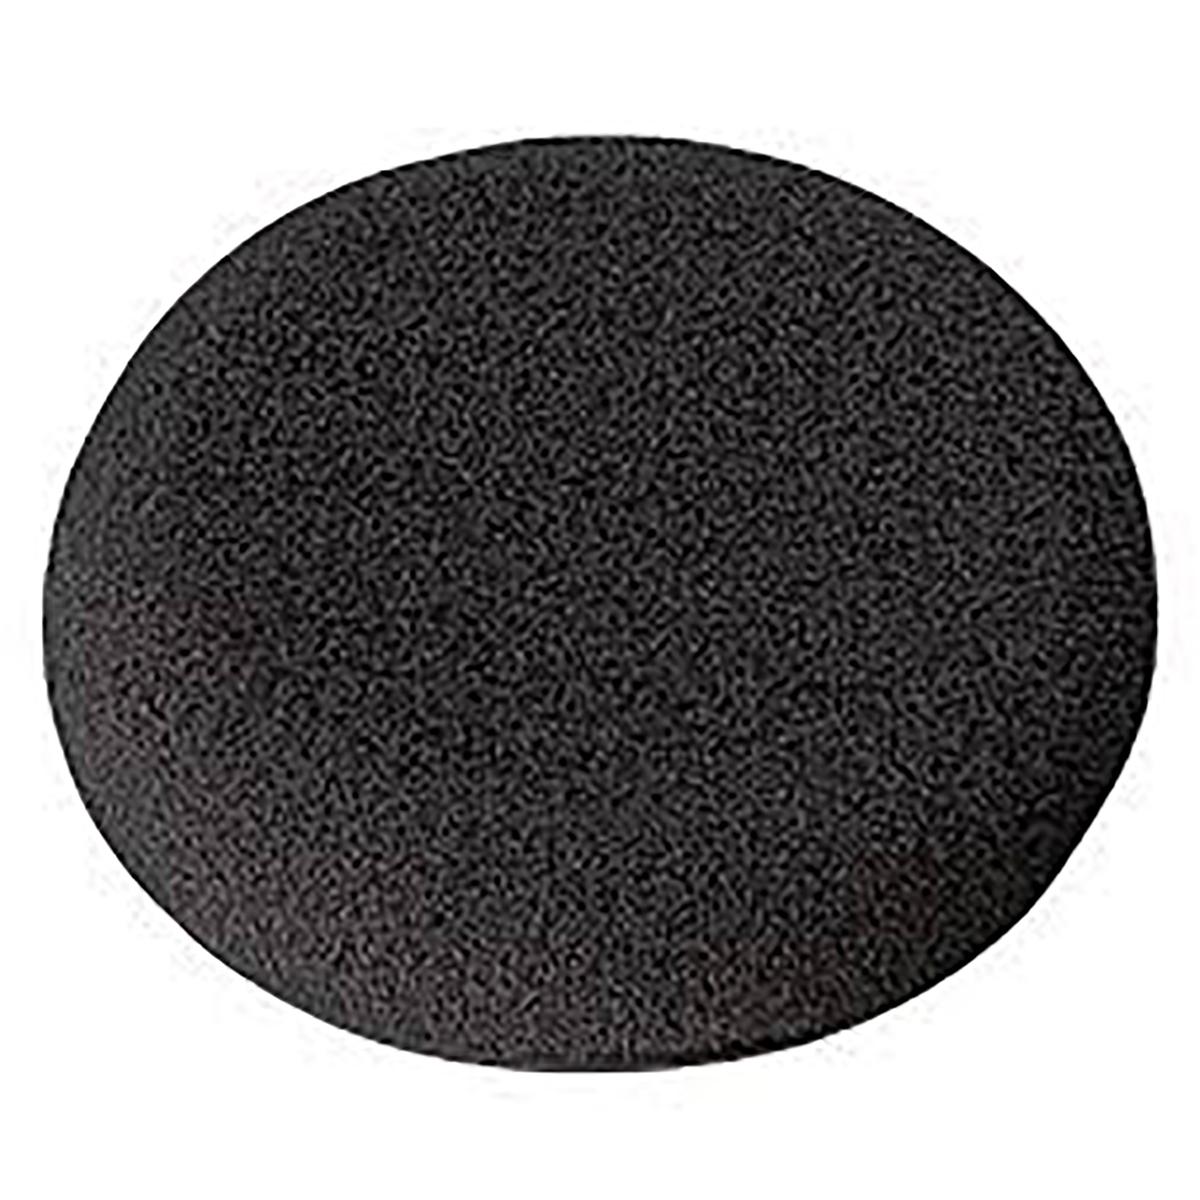 Plantronics 88817-01 Foam Ear Cushion - Single